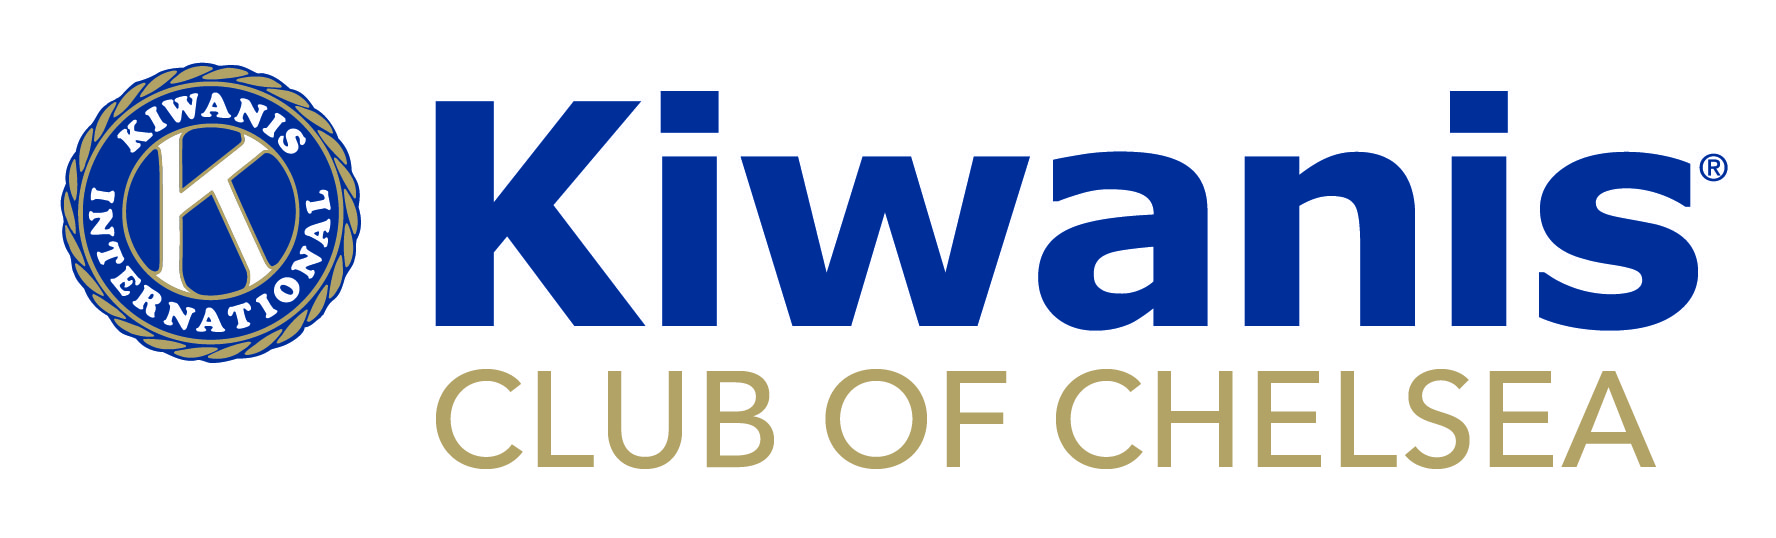 kiwanisofchelsea.org